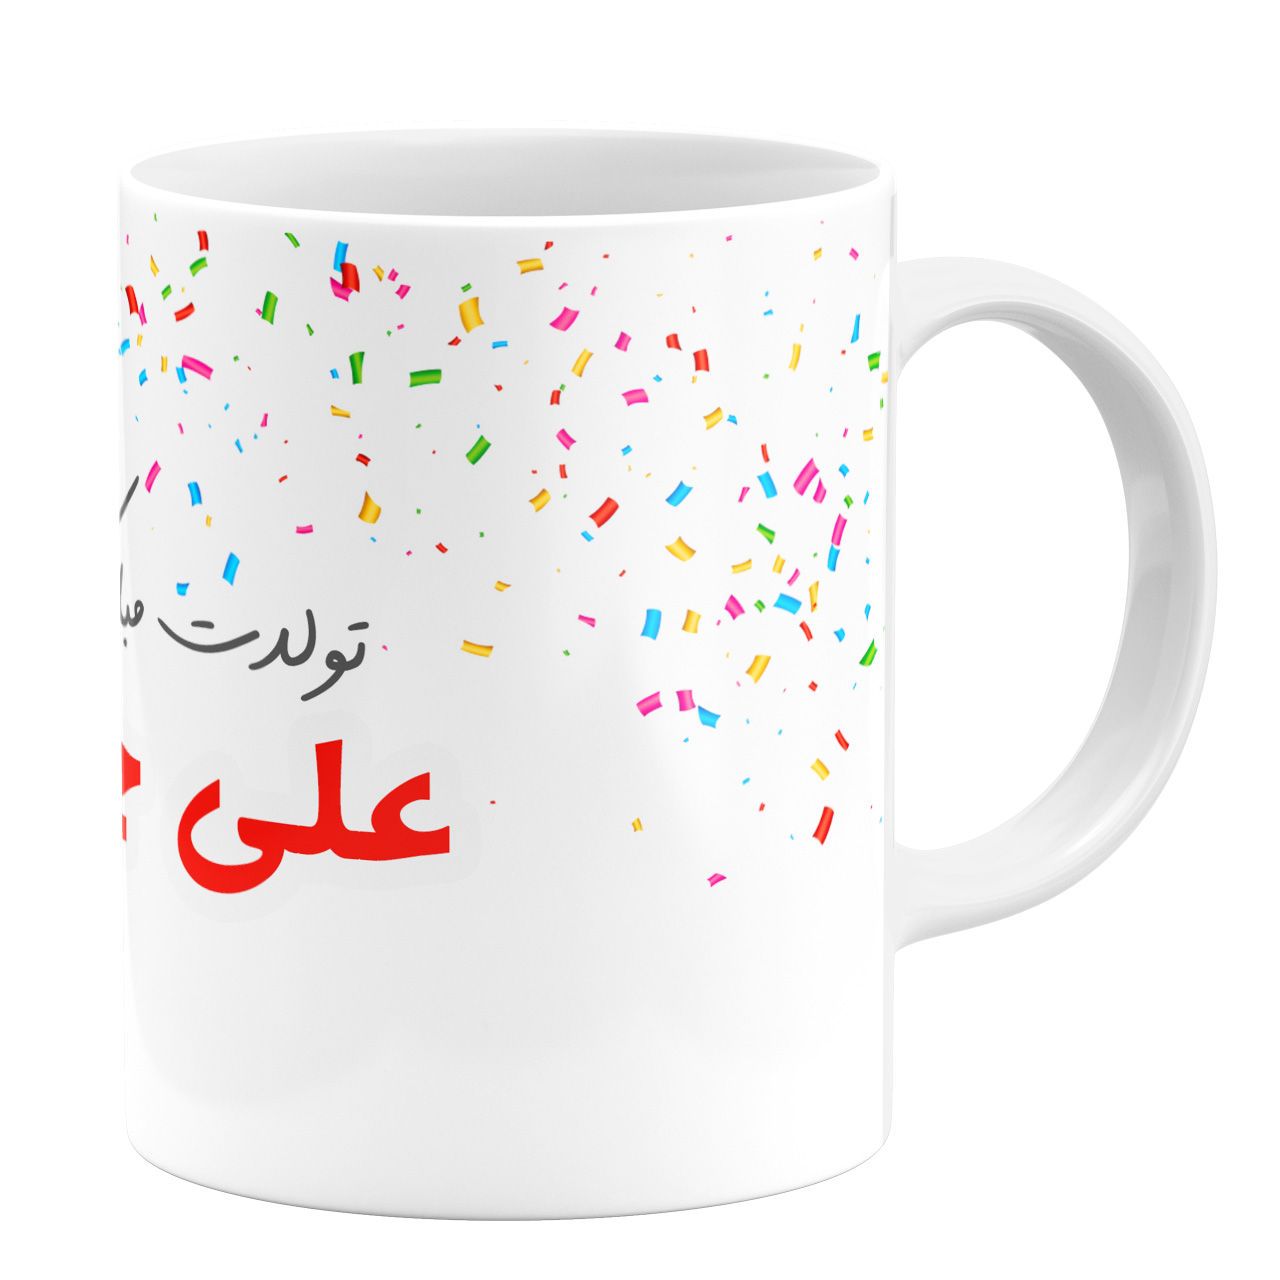 عکس ماگ طرح تولد اسم علی کد 1105409191